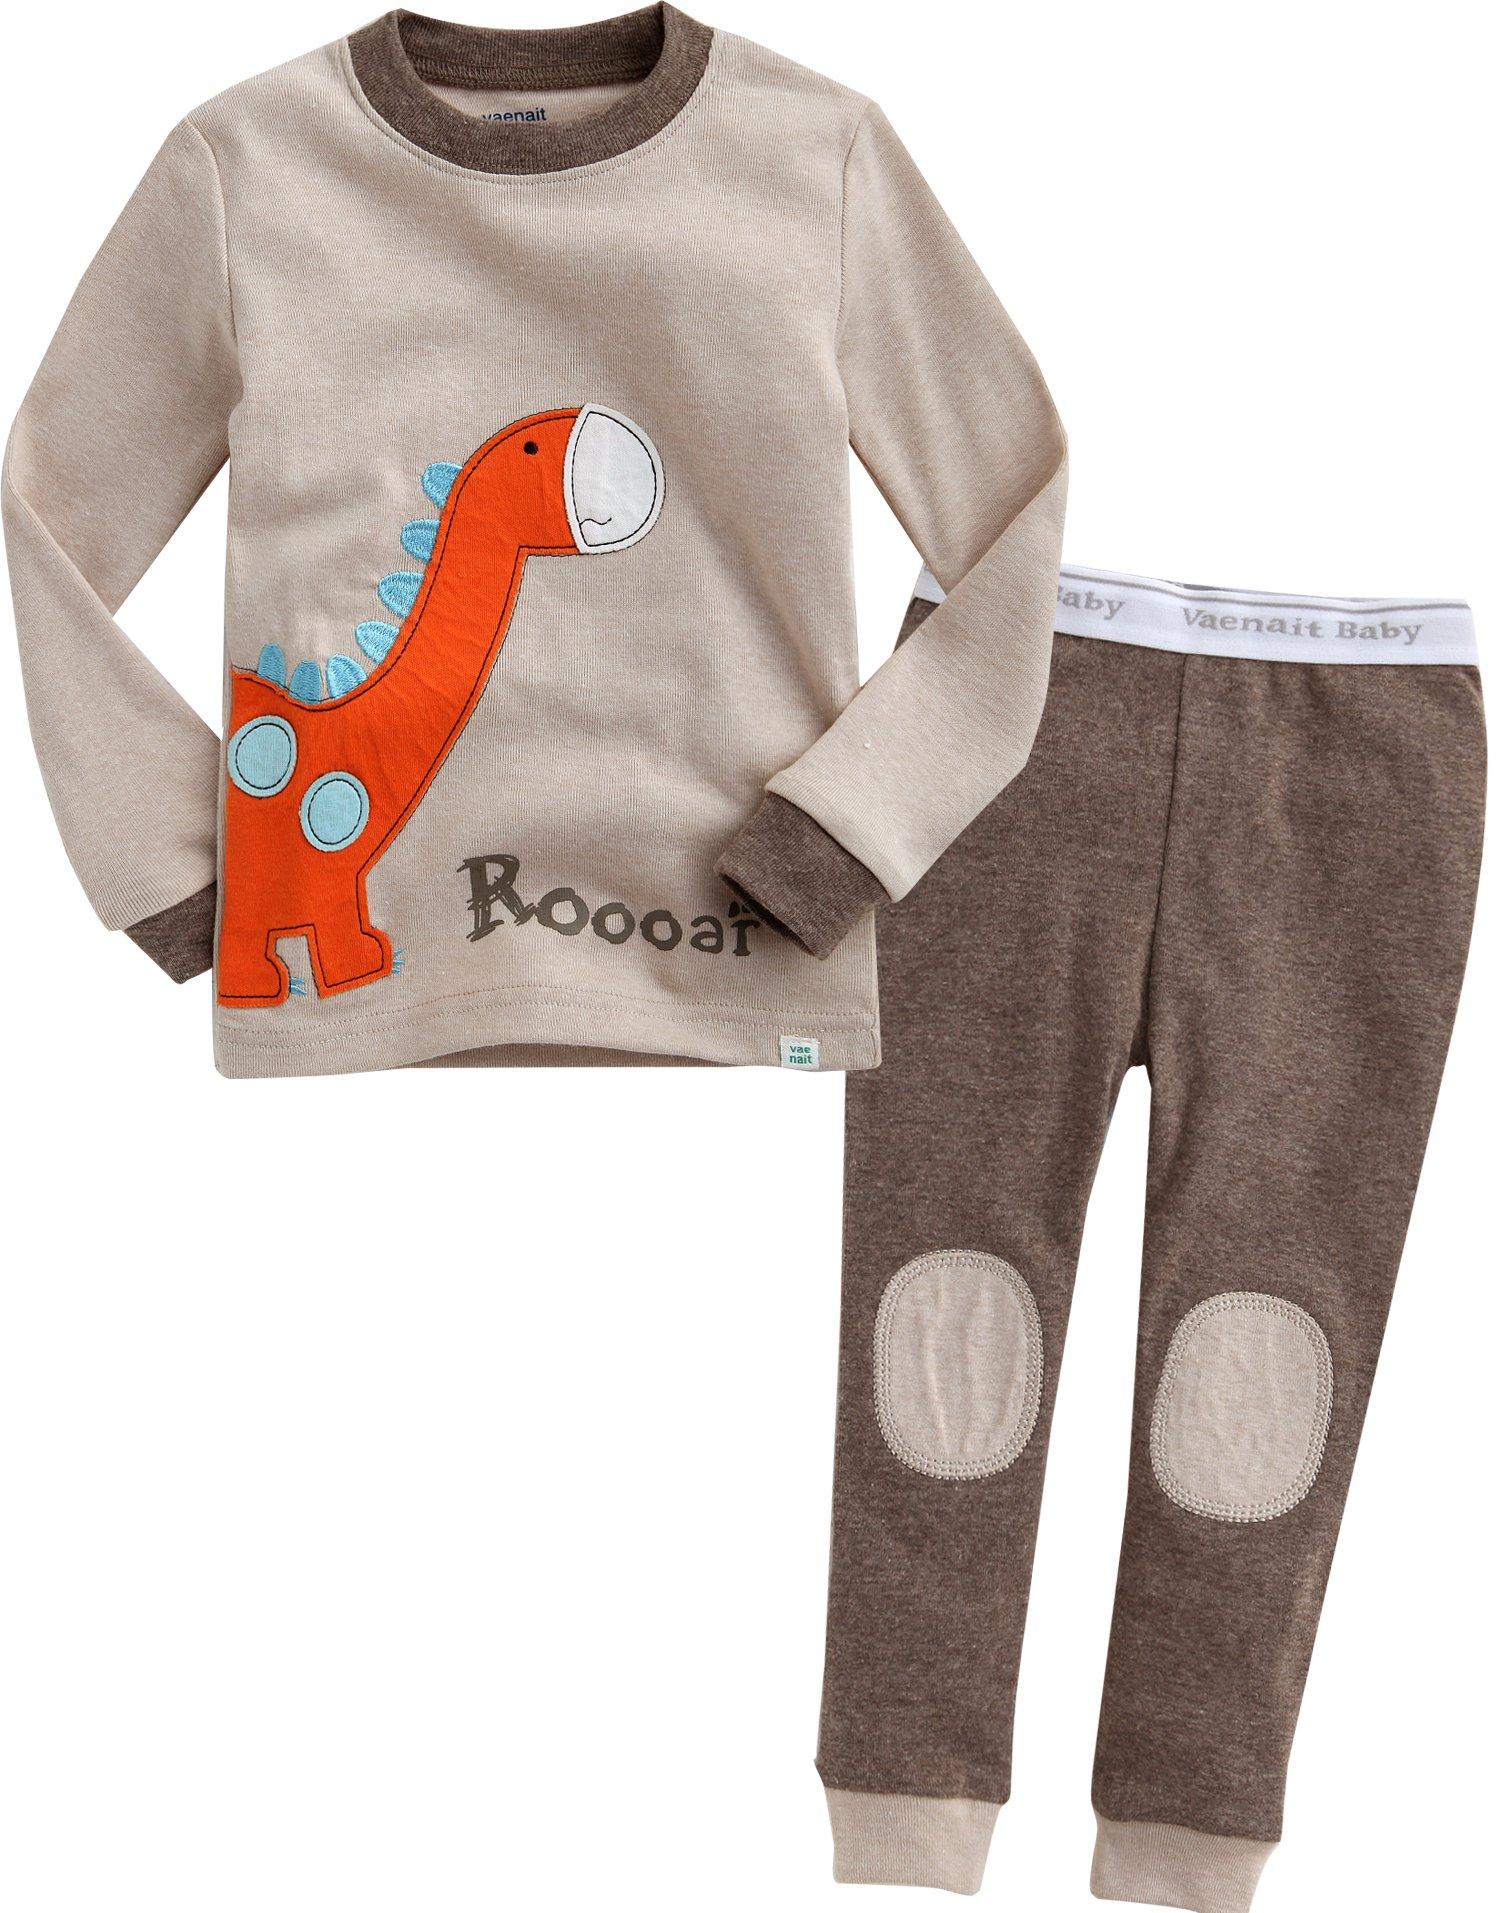 Vaenait baby 12M-7T Kids Boys Sleepwear Pajama 2pcs Set Brown Dino L